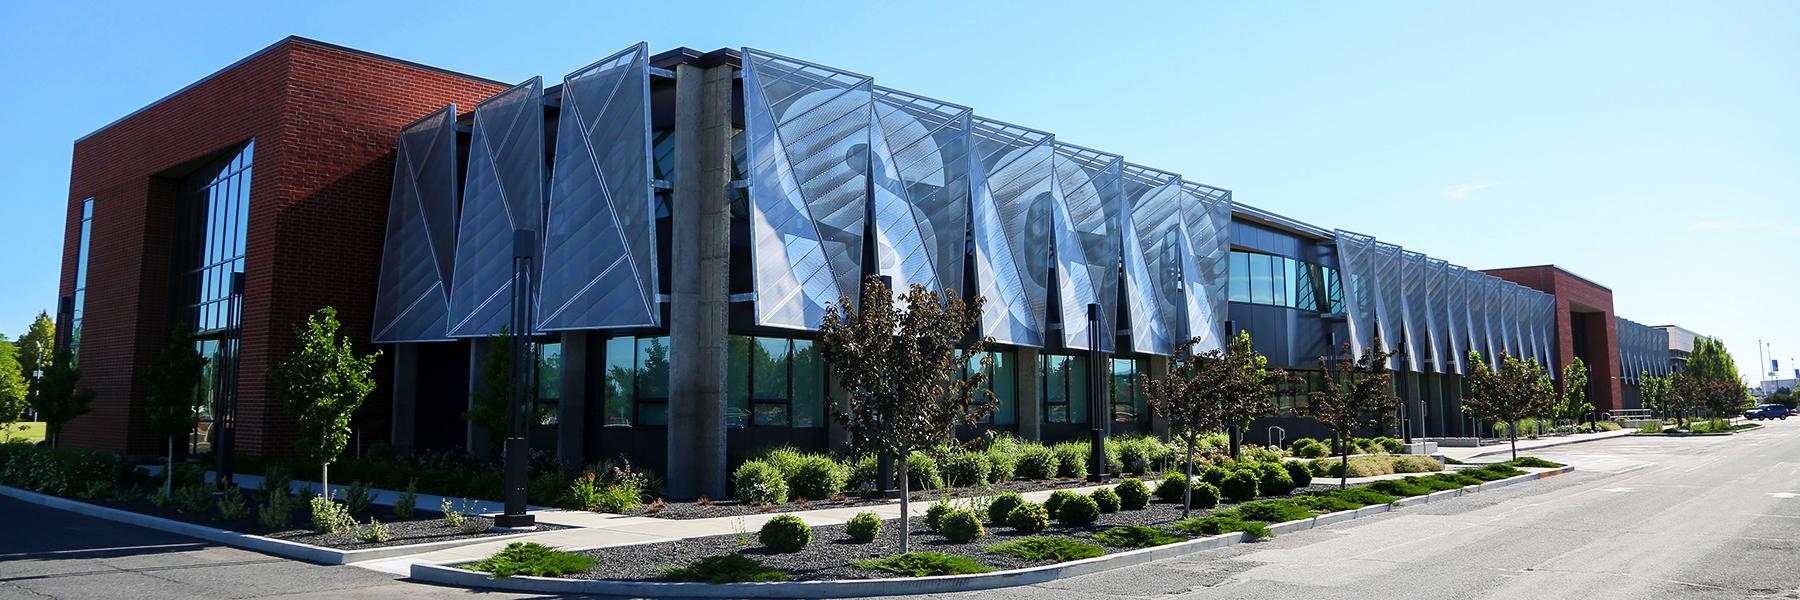 Spokane Community College Building One